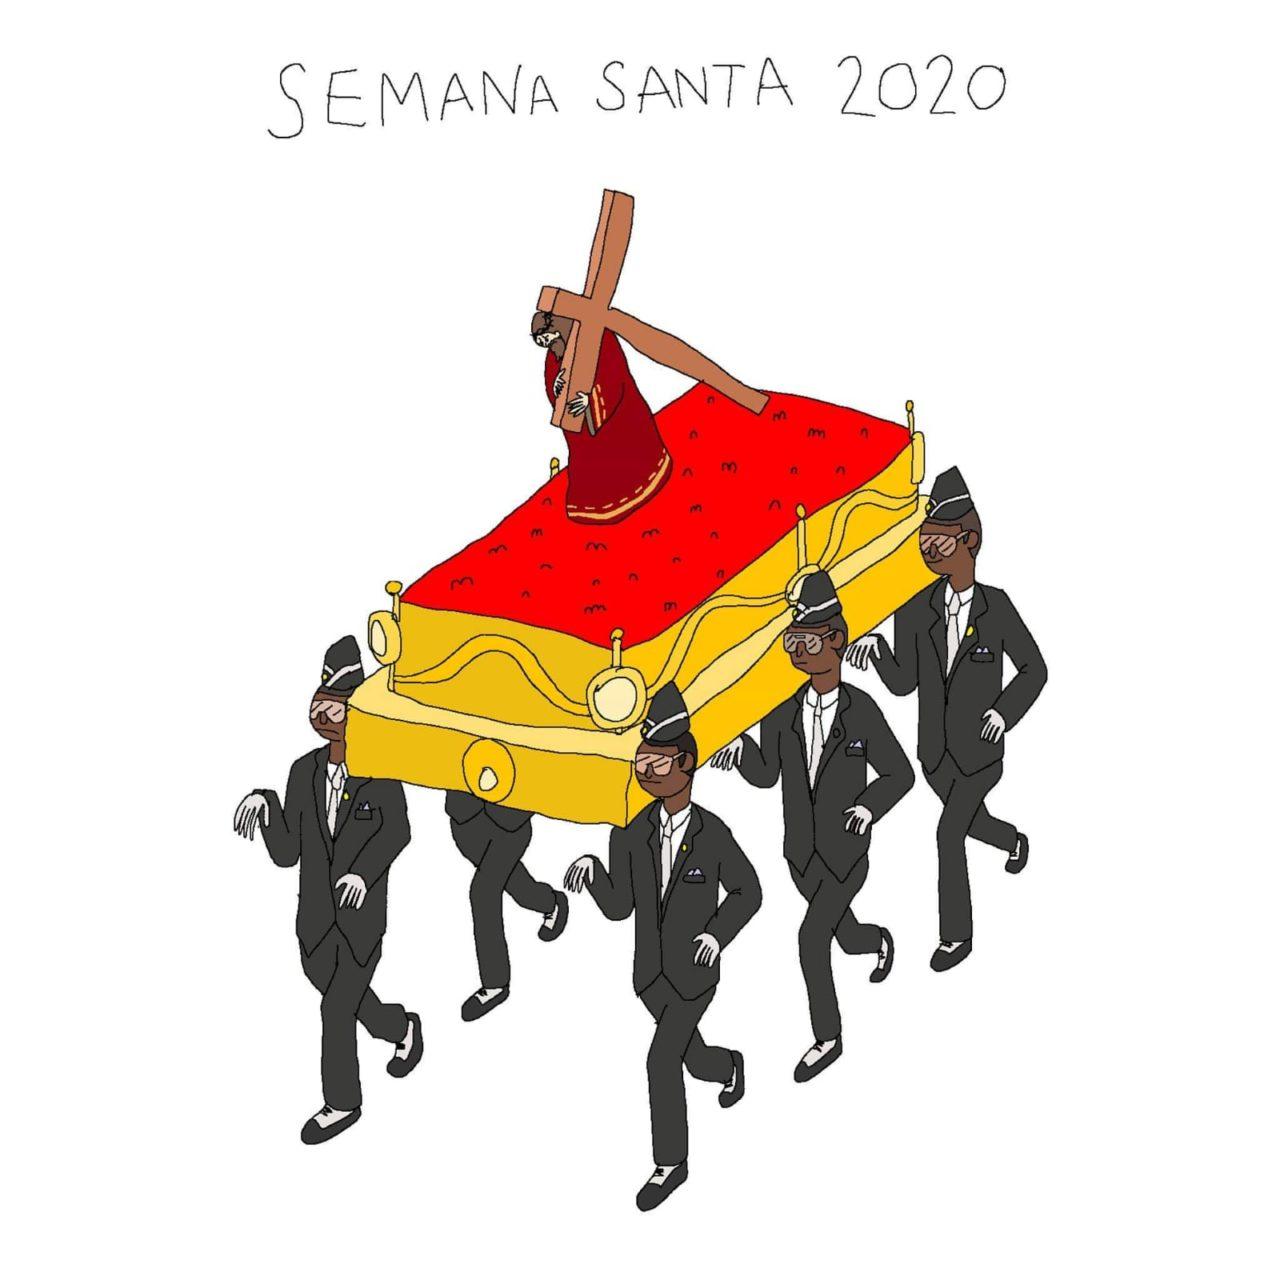 Este meme vino a compensar la falta de procesiones esta Semana Santa